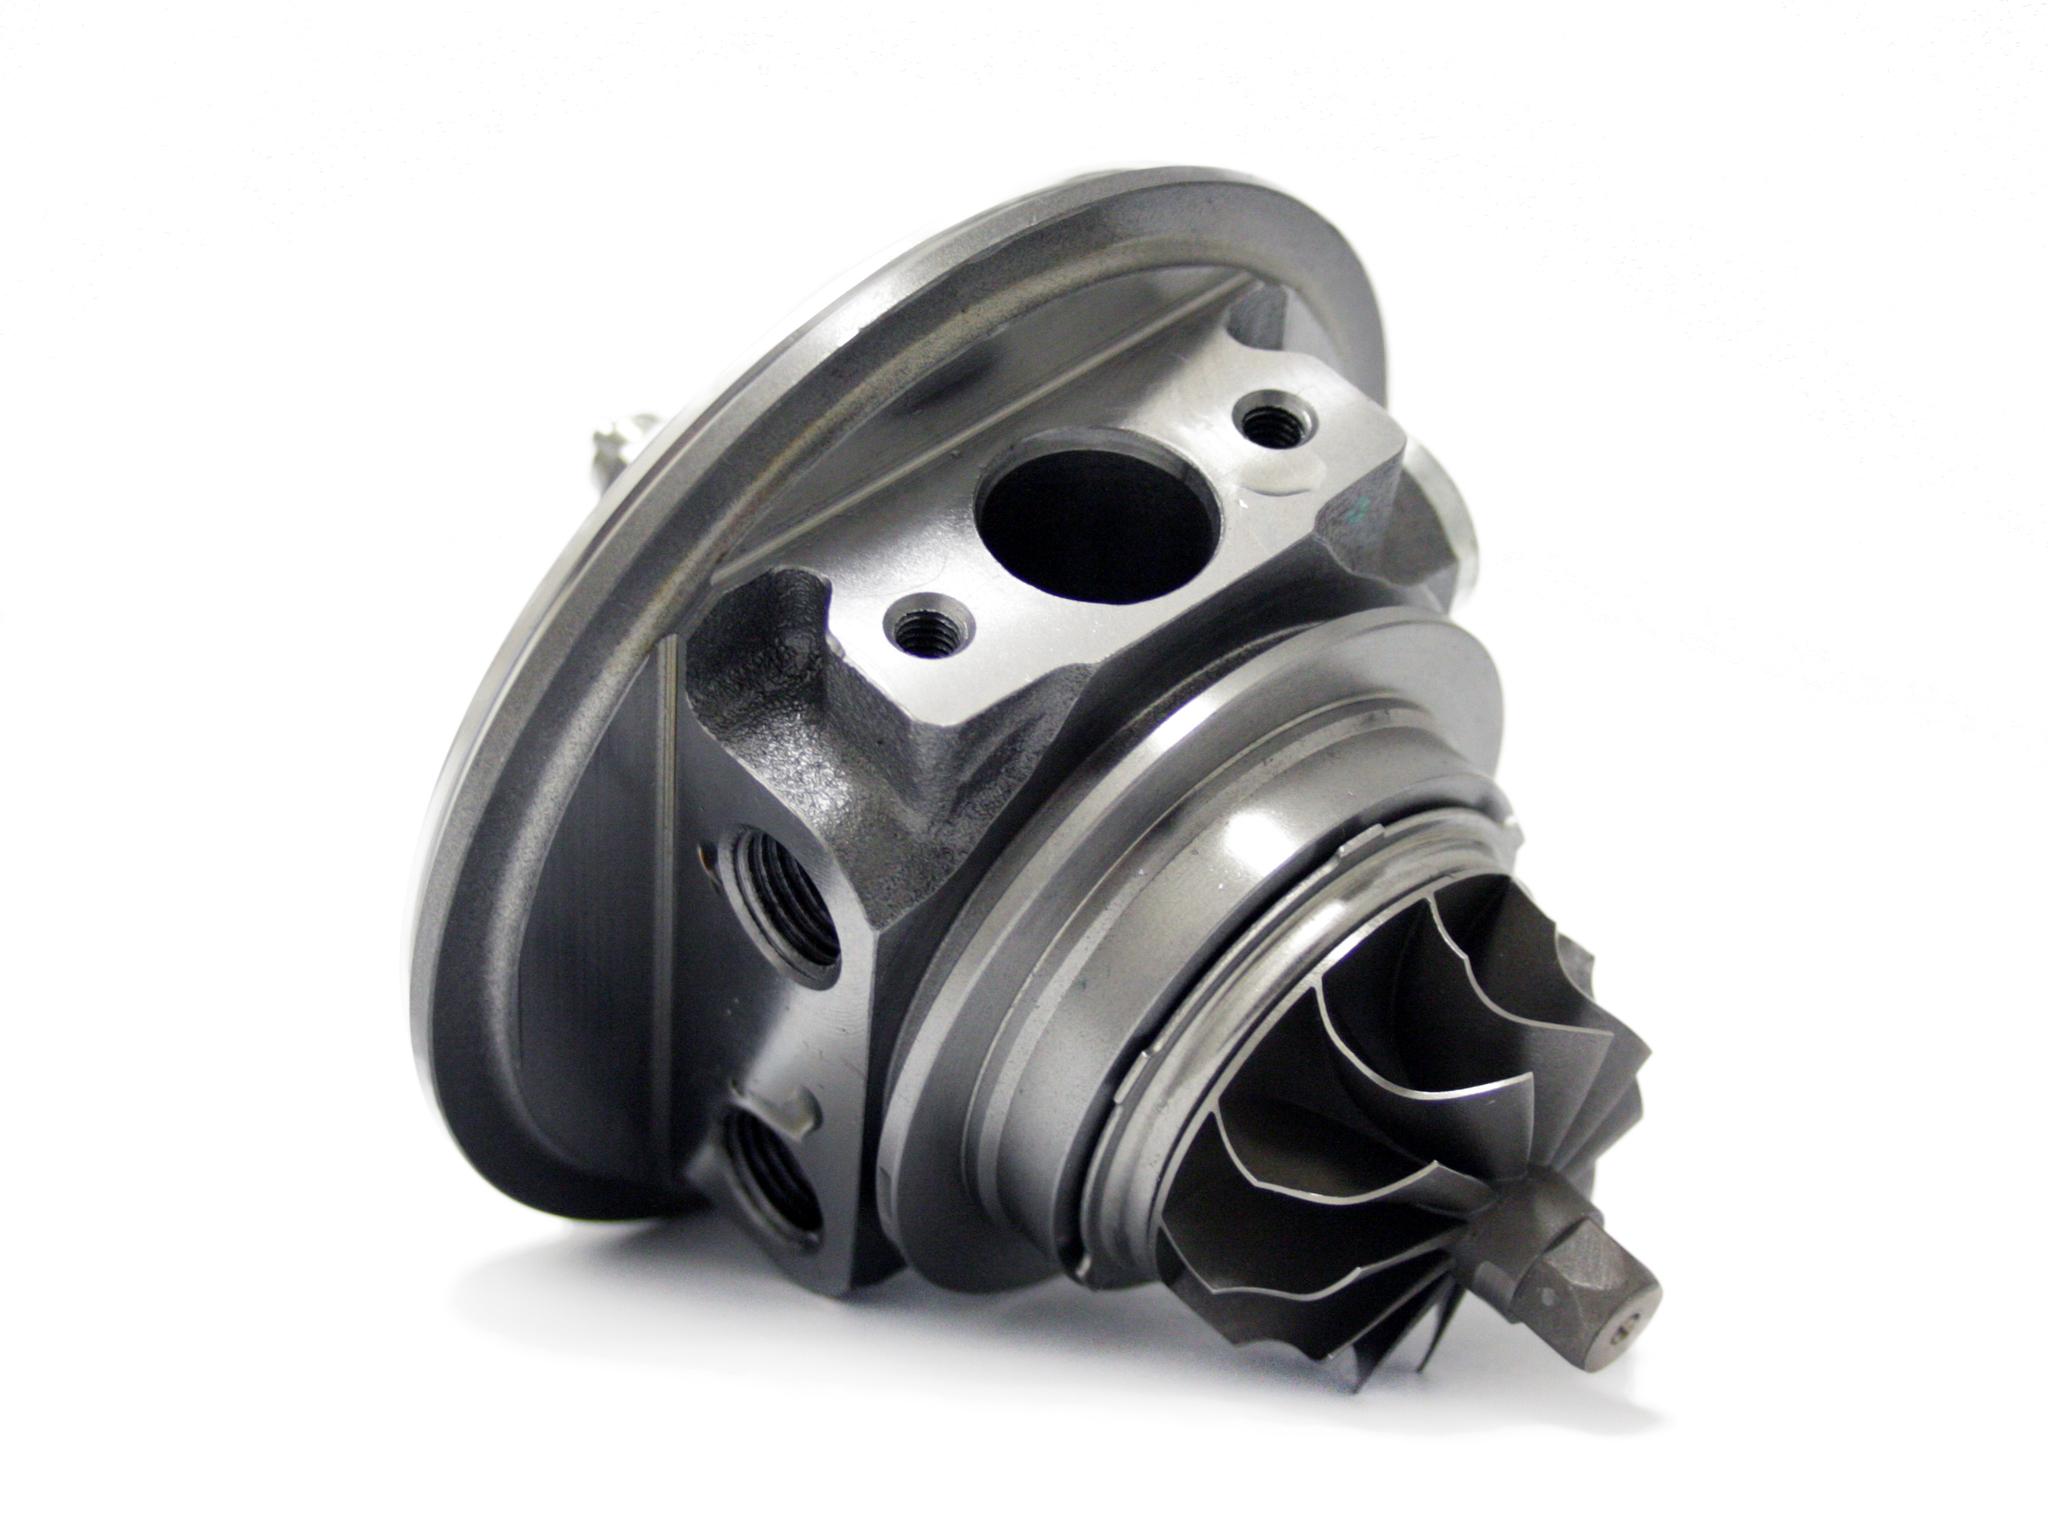 Картридж турбины К03 Ситроен 1.6 EP6DT 150-163 л.с.